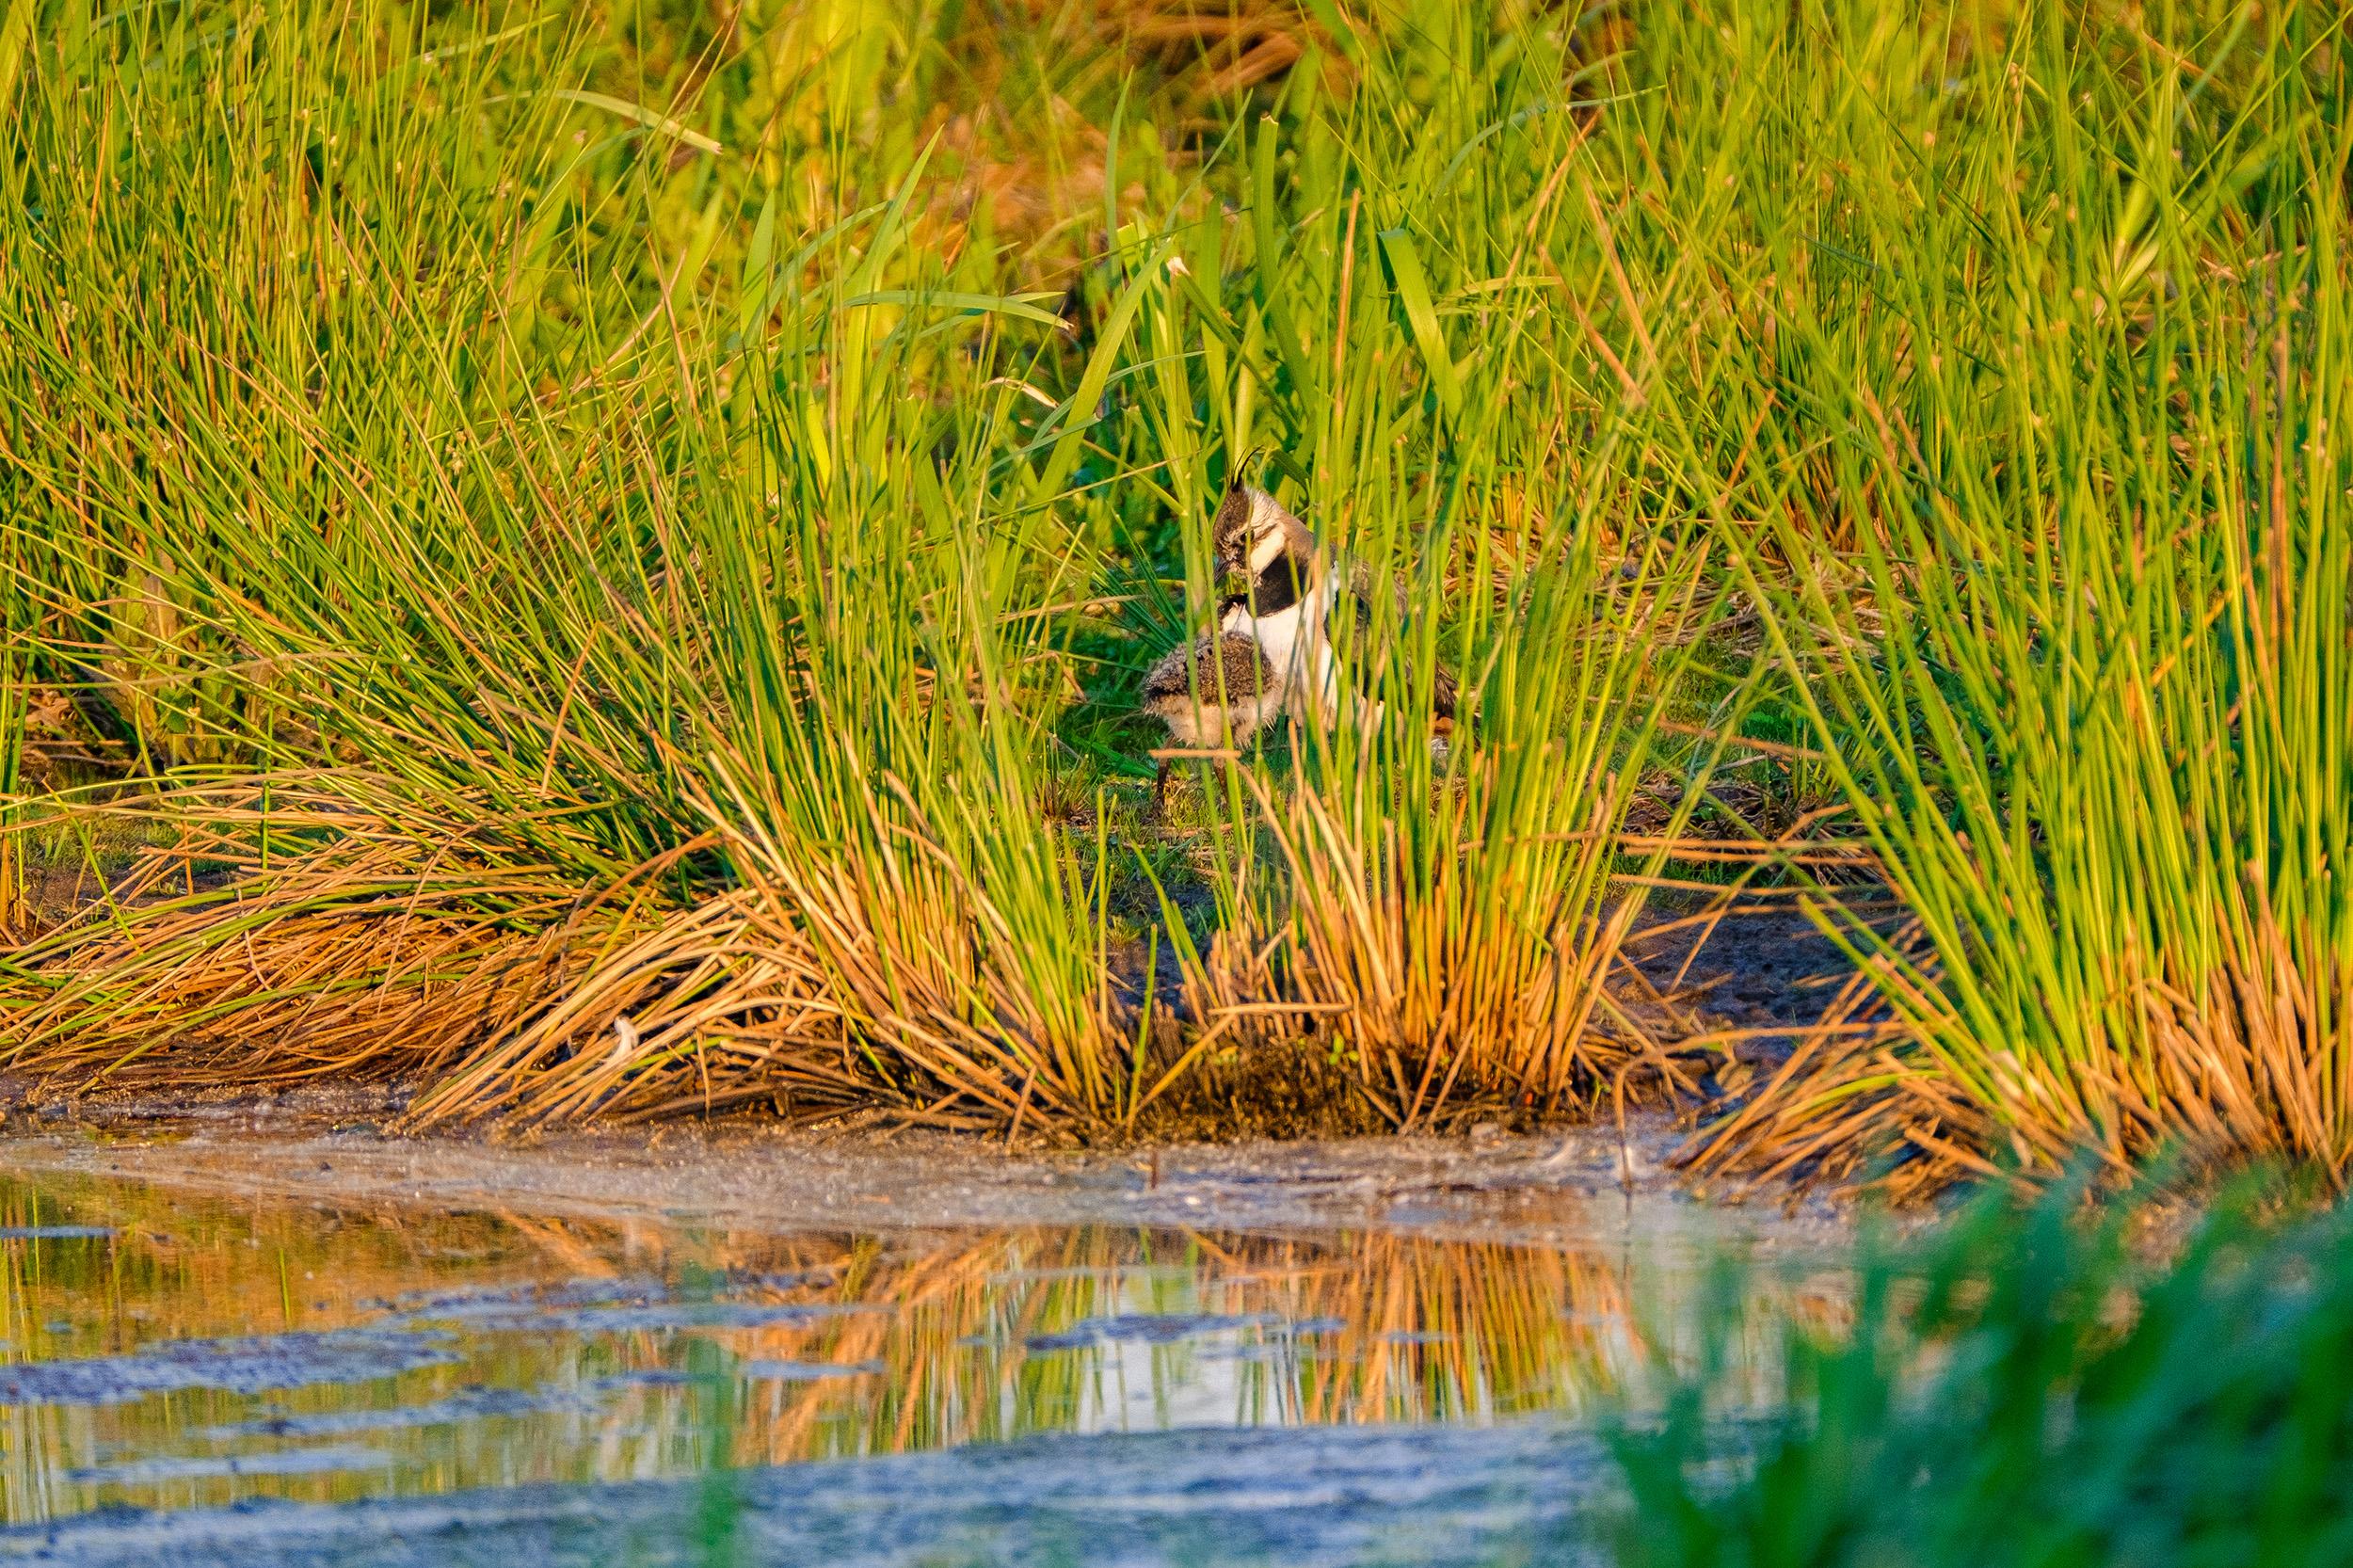 nature-bird-evening (10 of 10).jpg